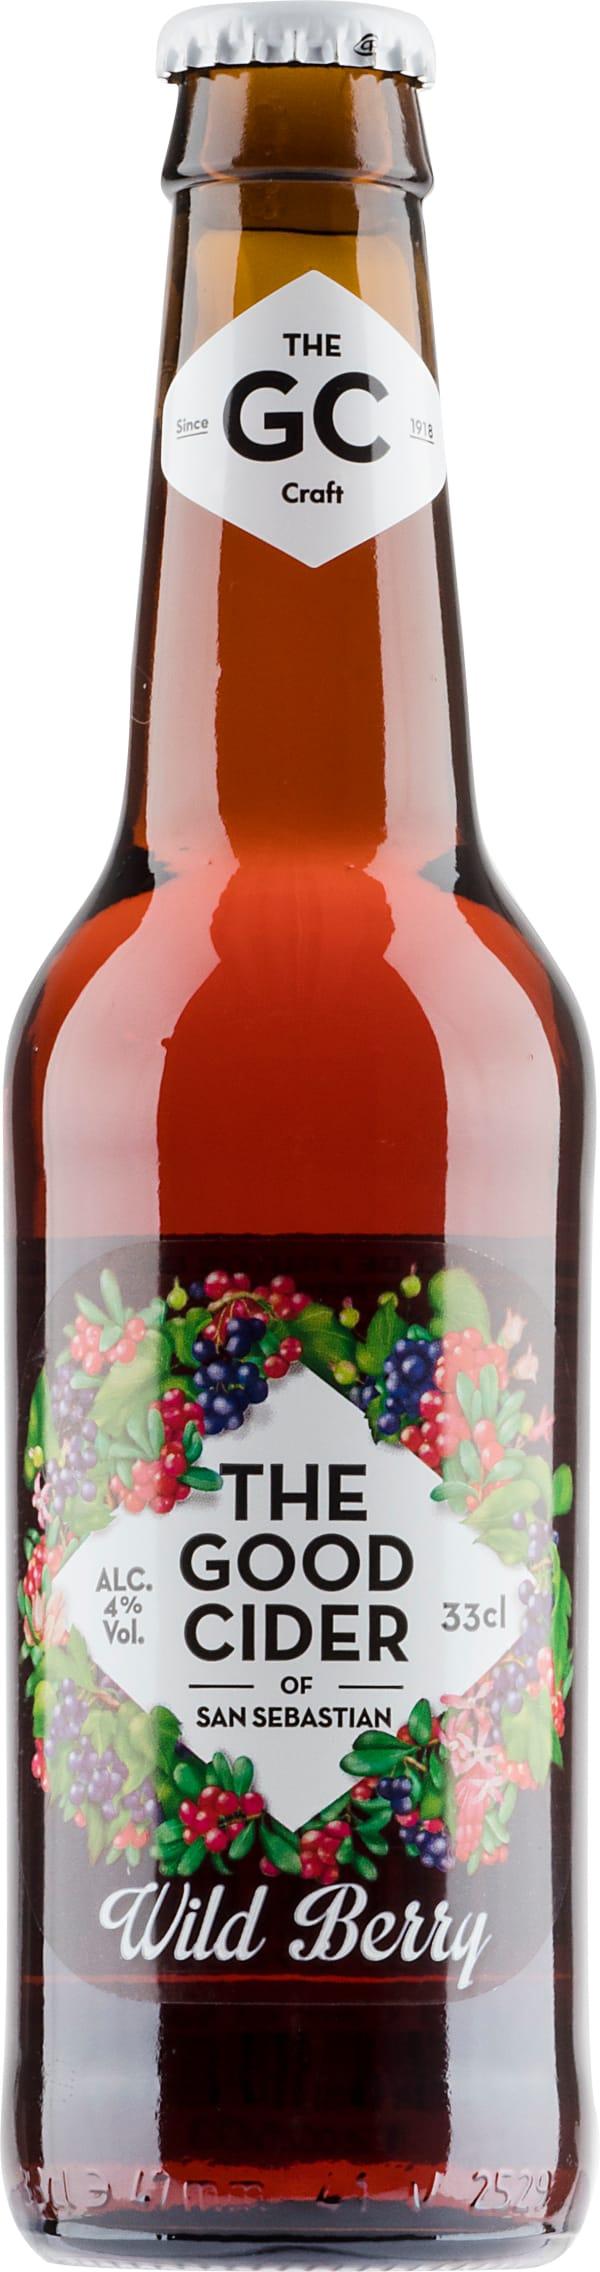 The Good Cider of San Sebastian Wild Berry